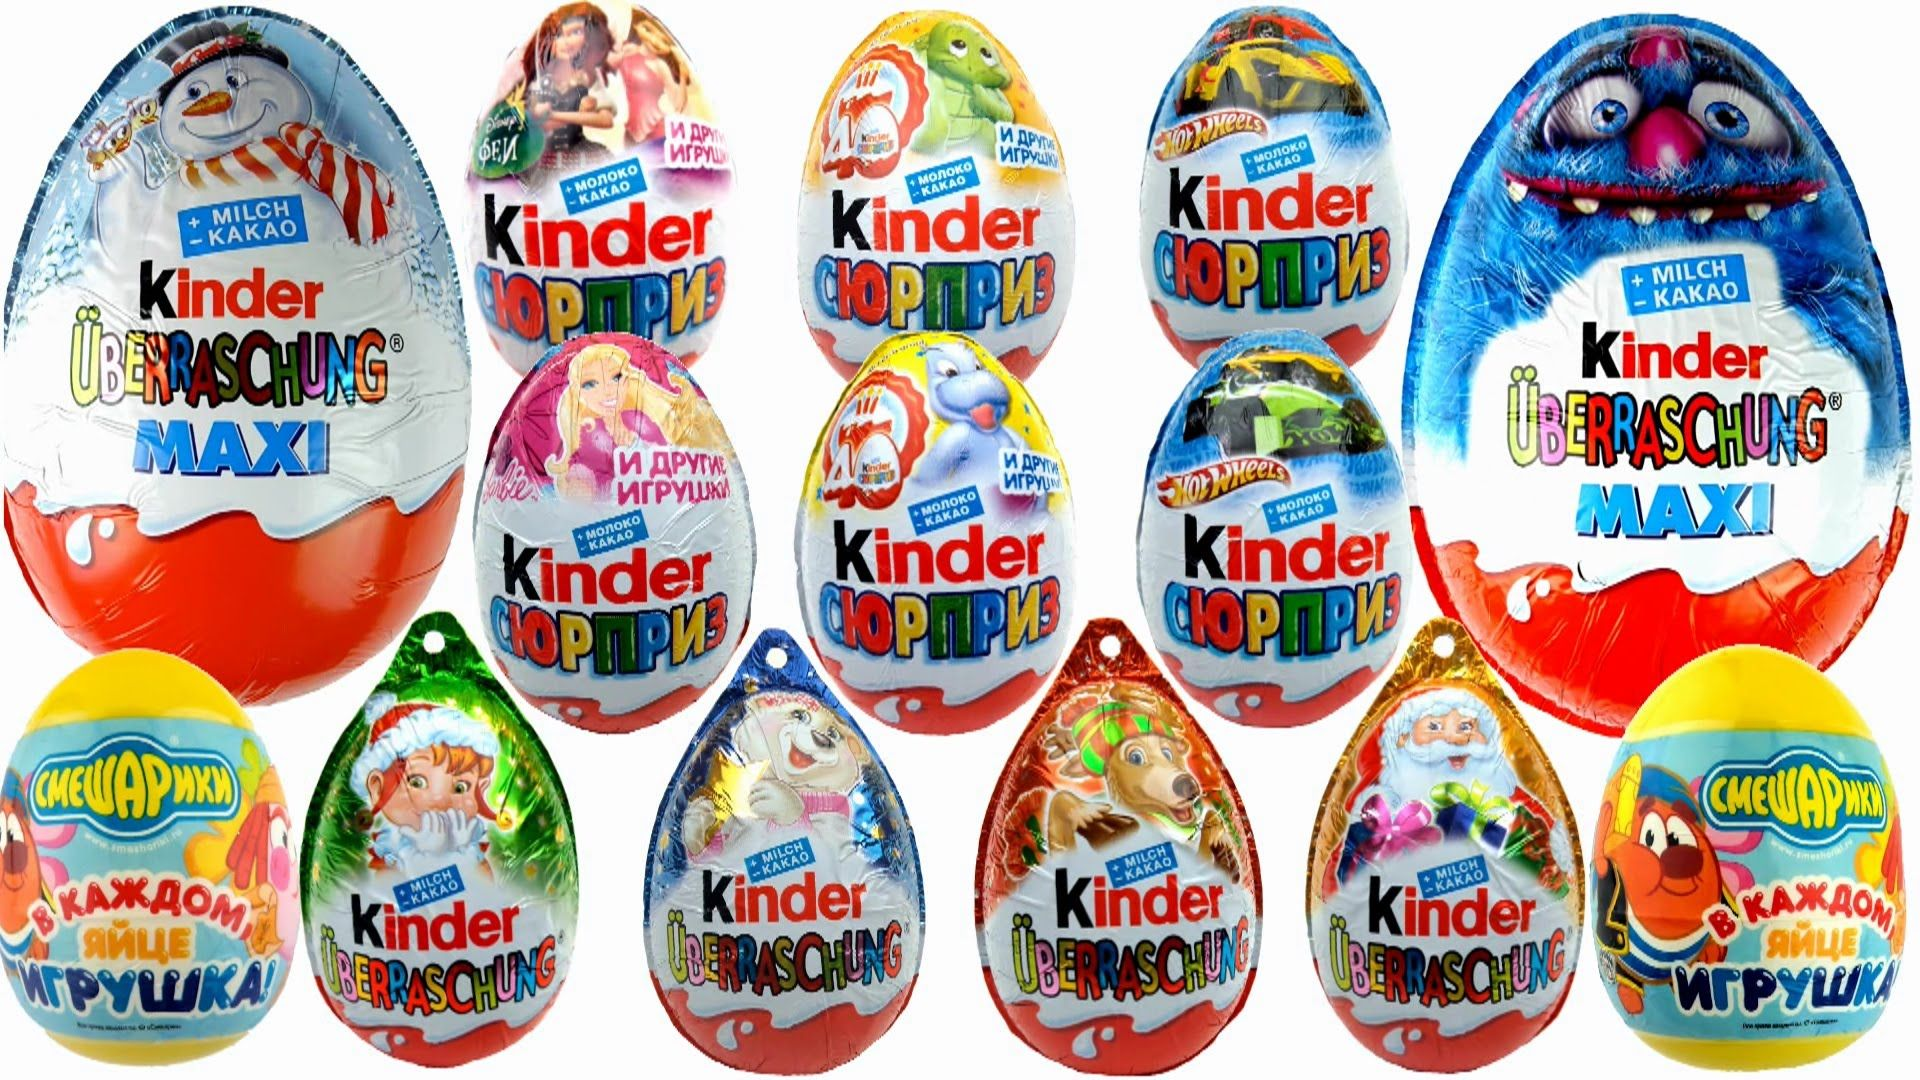 Kinder joy toys car   Surprise Eggs Kinder Surprise MAXI Chocolate Egg with Toy Inside